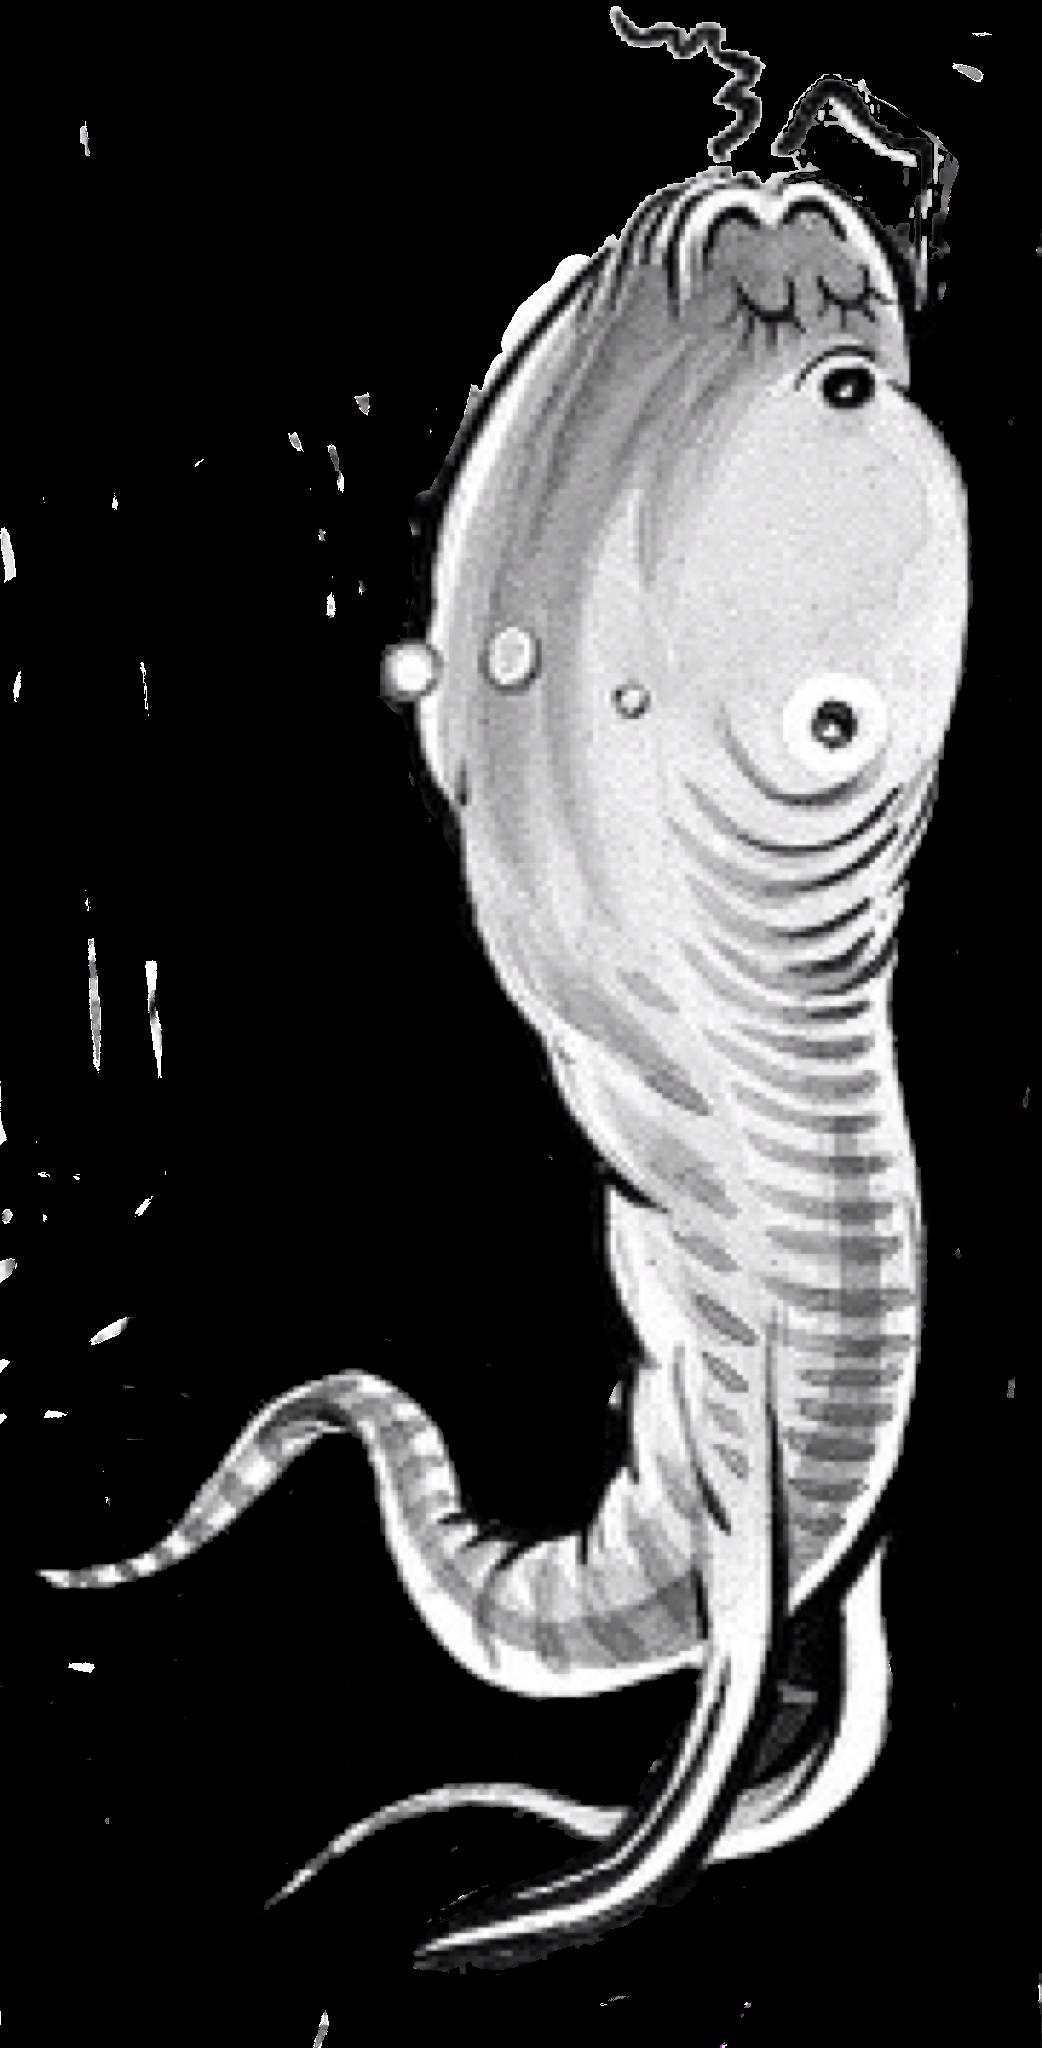 Glurk Fish